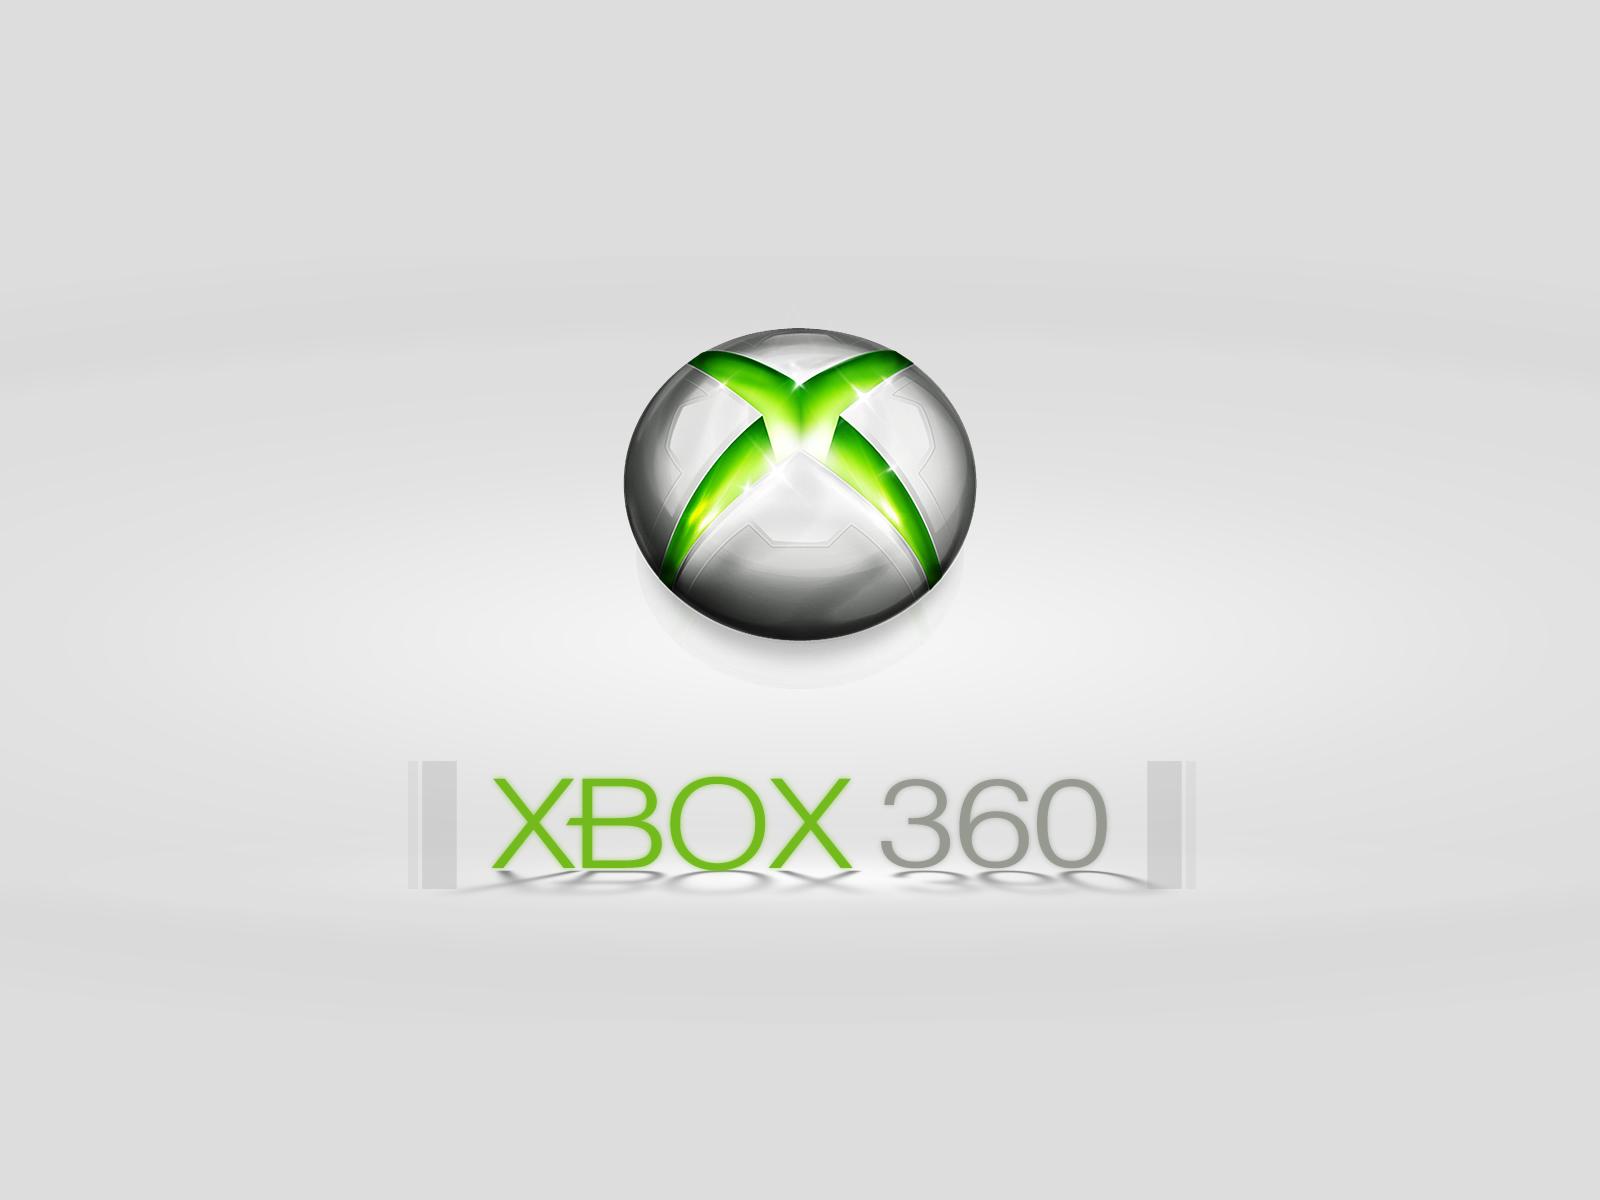 XBOX 360 Logo wallpaper by Liandrolisk 1600x1200